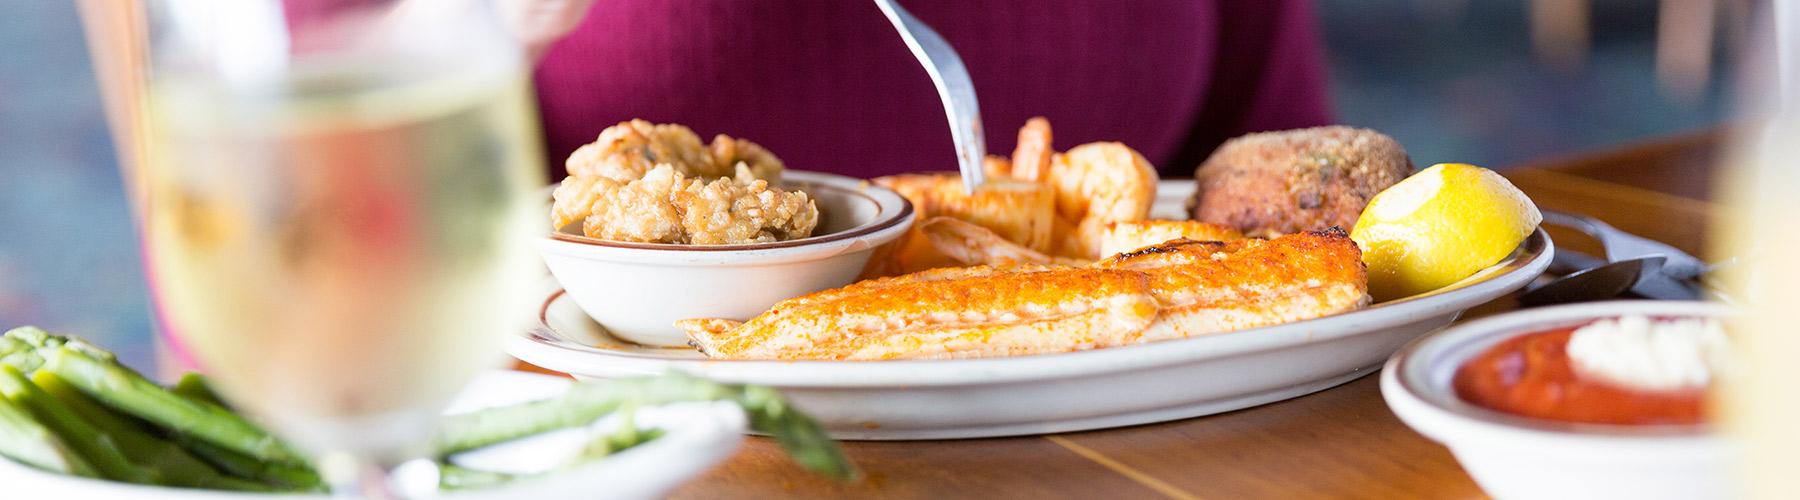 Myrtle Beach Restaurant Reviews